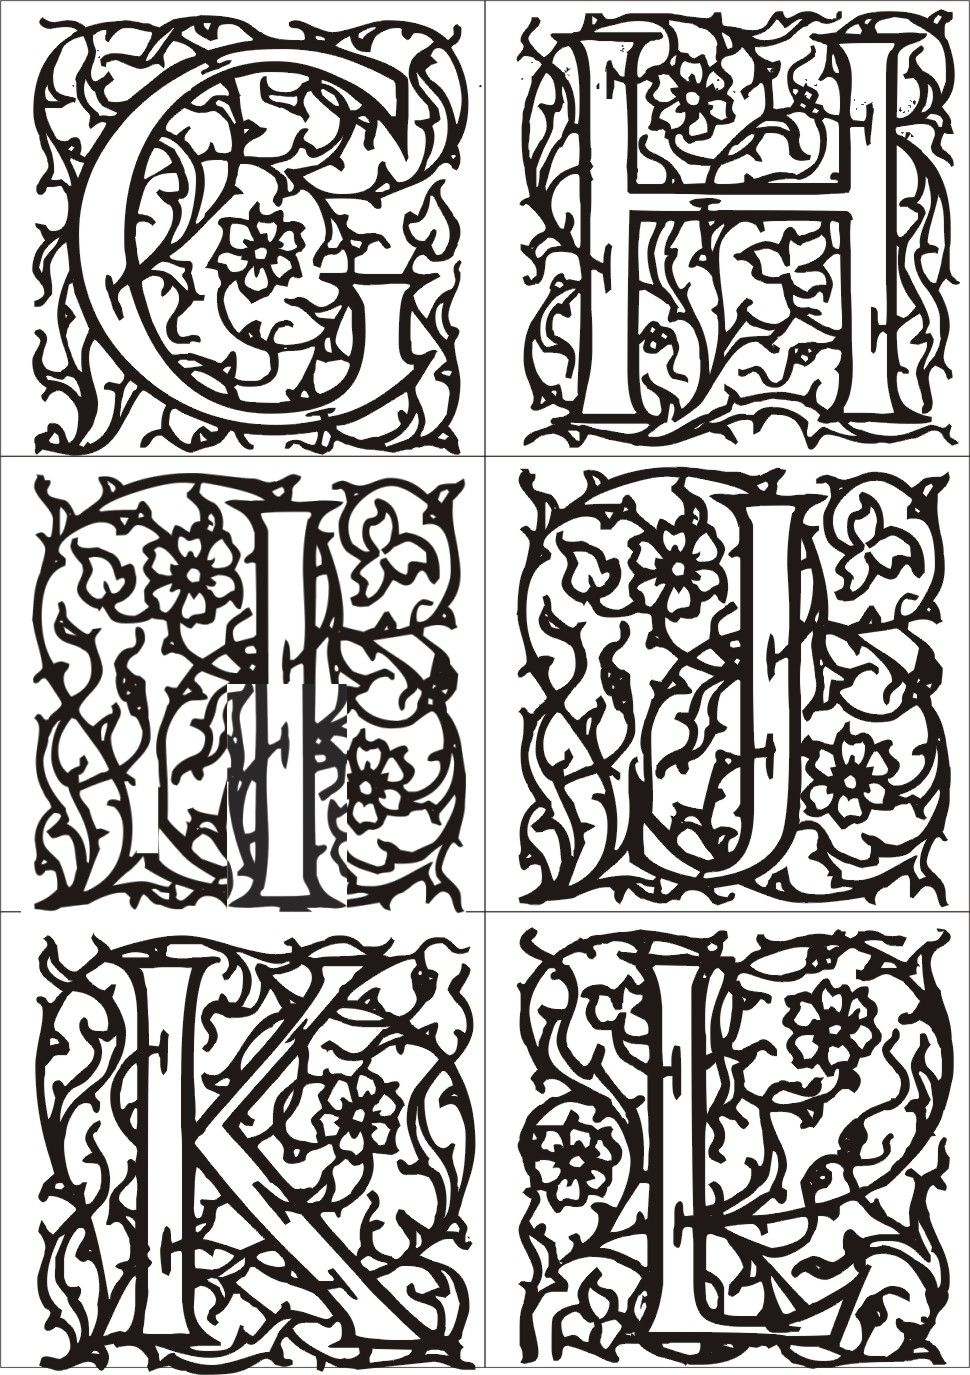 coloriage lettre v enl lettre m scarino  page 2